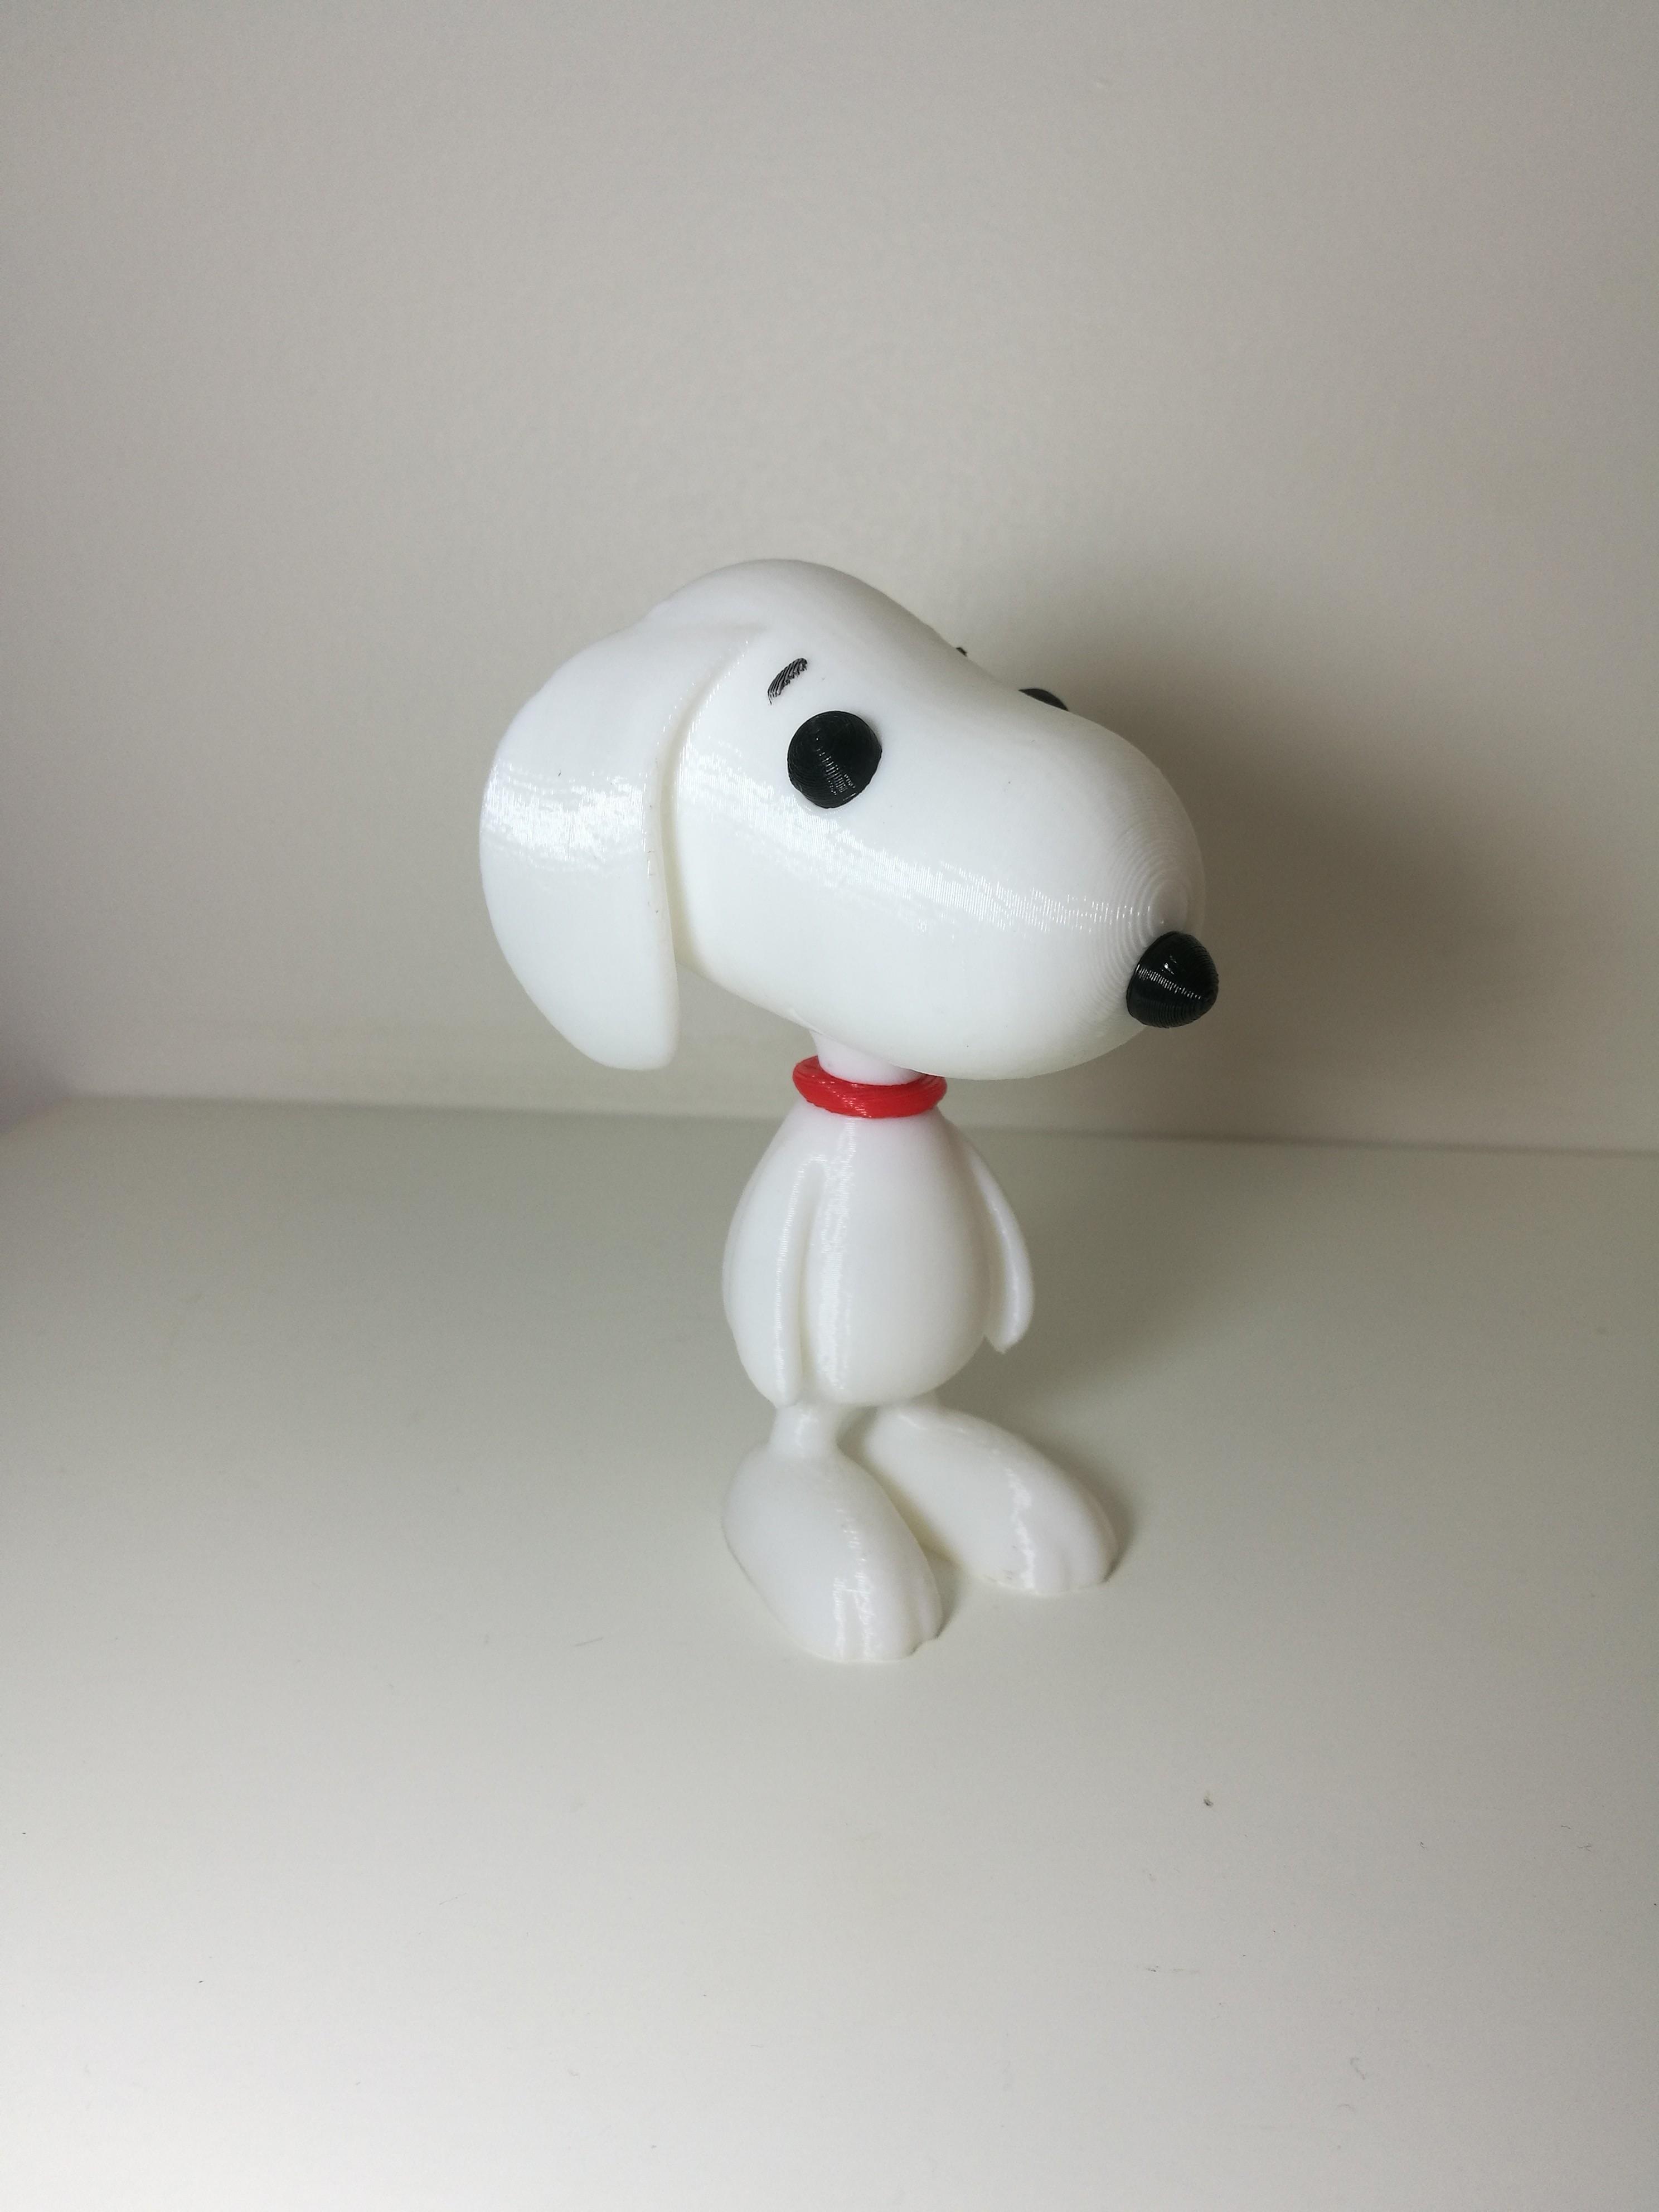 IMG_20171231_032945.jpg Download free STL file Snoopy • 3D printable design, Rodrim